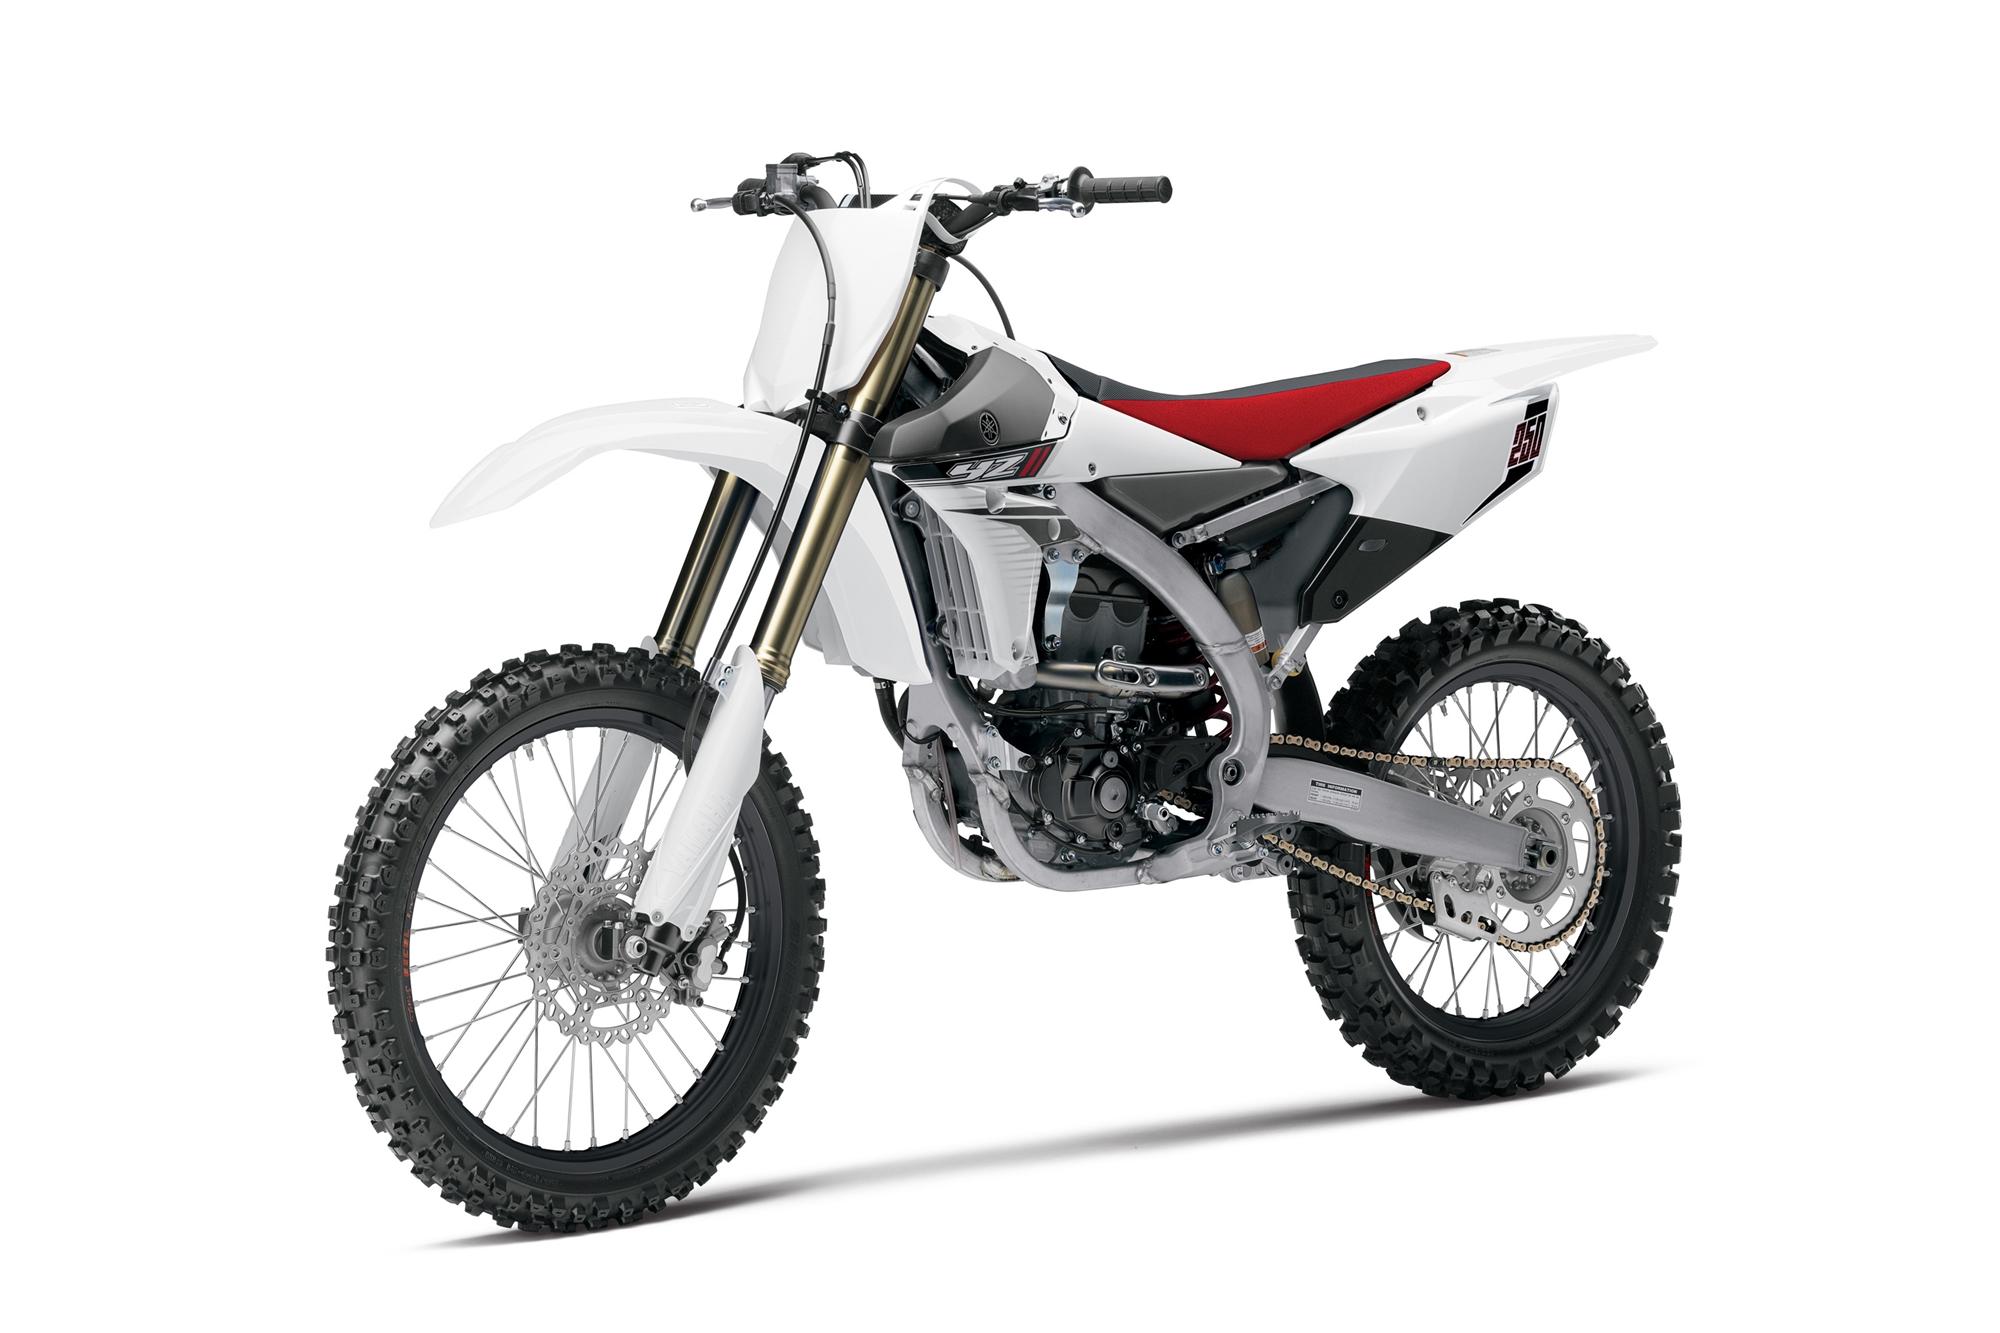 2014 Yamaha YZ 250 Photos, Informations, Articles - Bikes